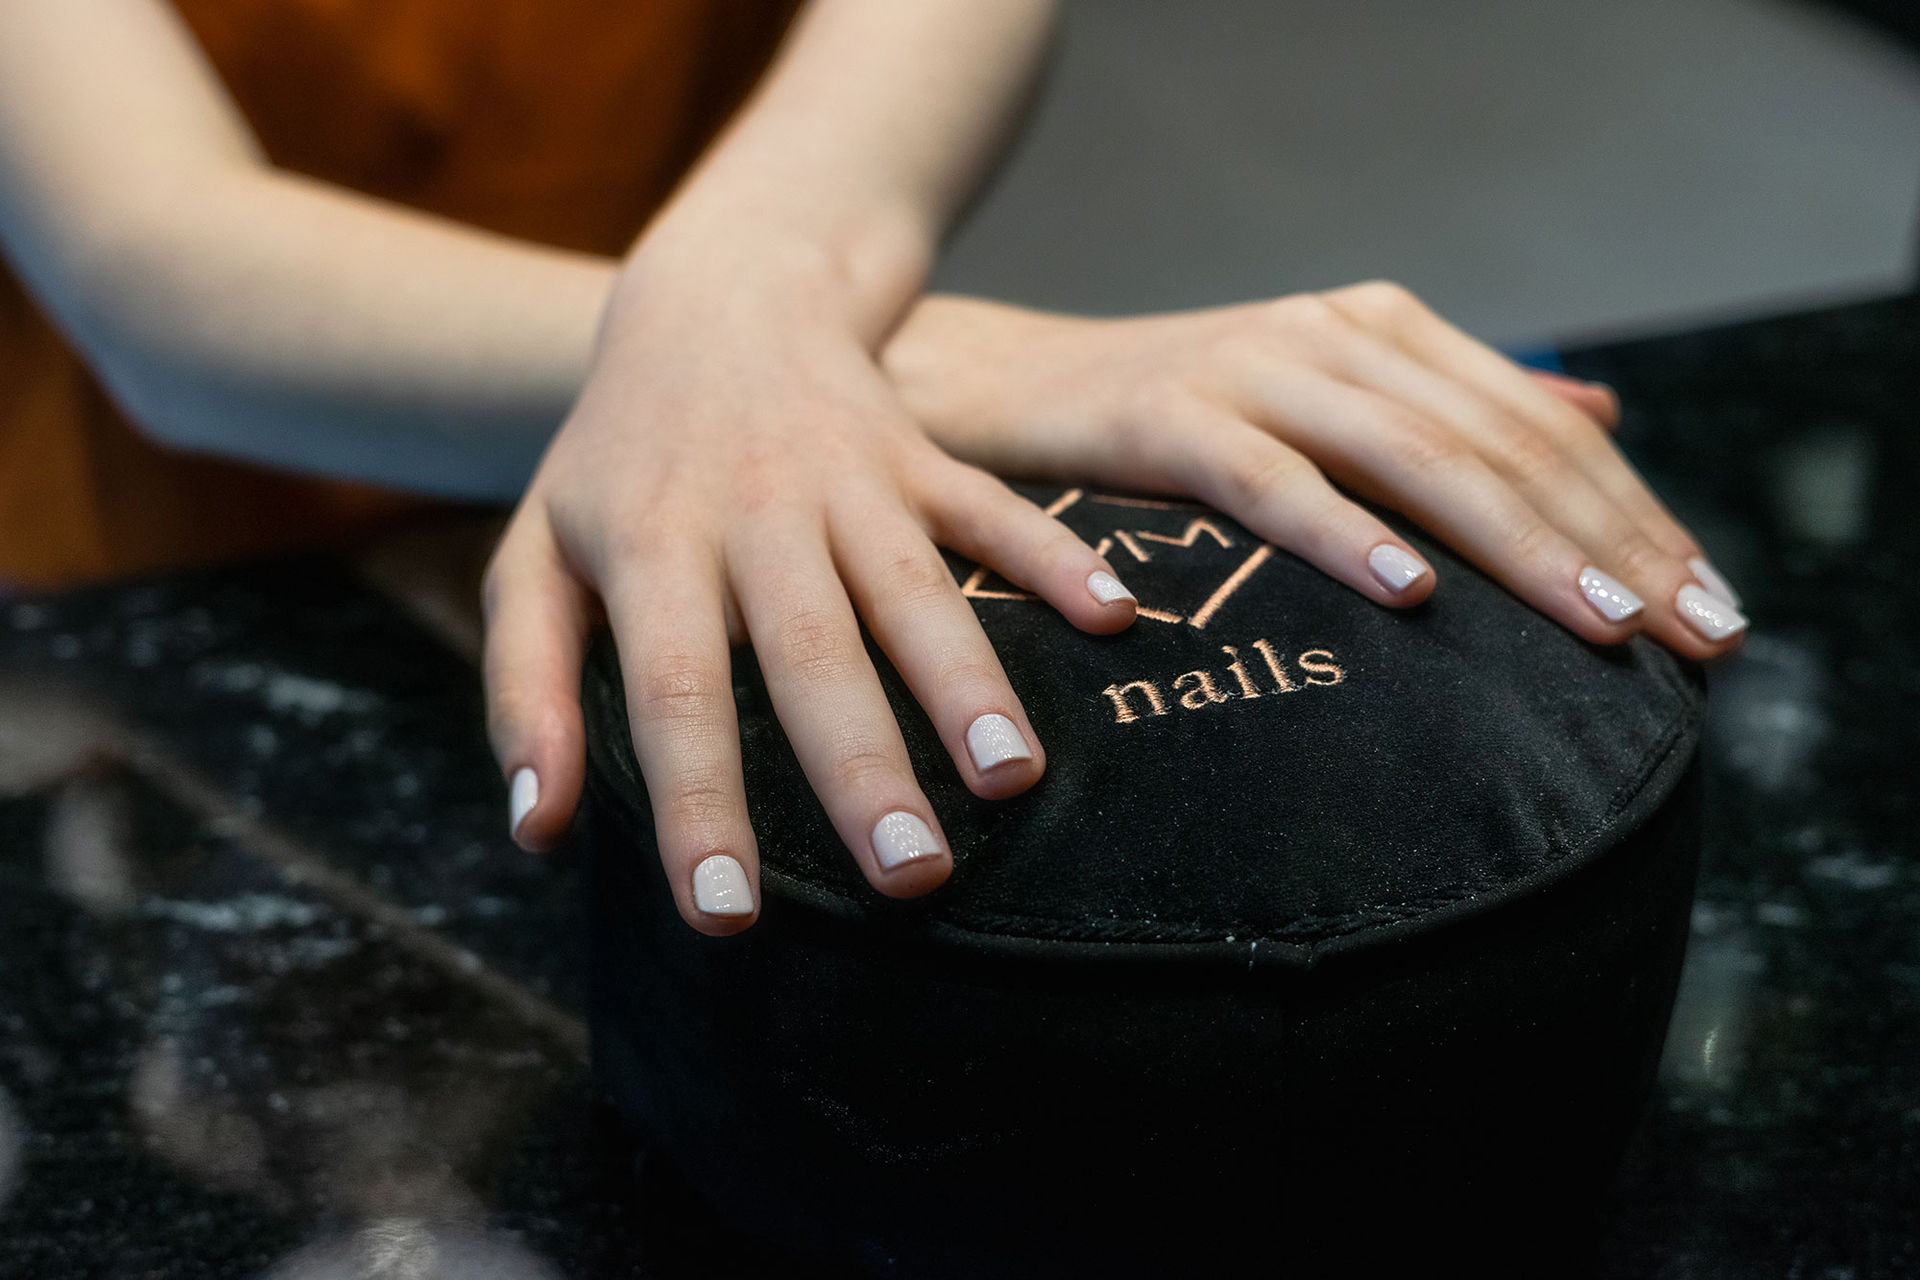 manolo-nails-7.jpg